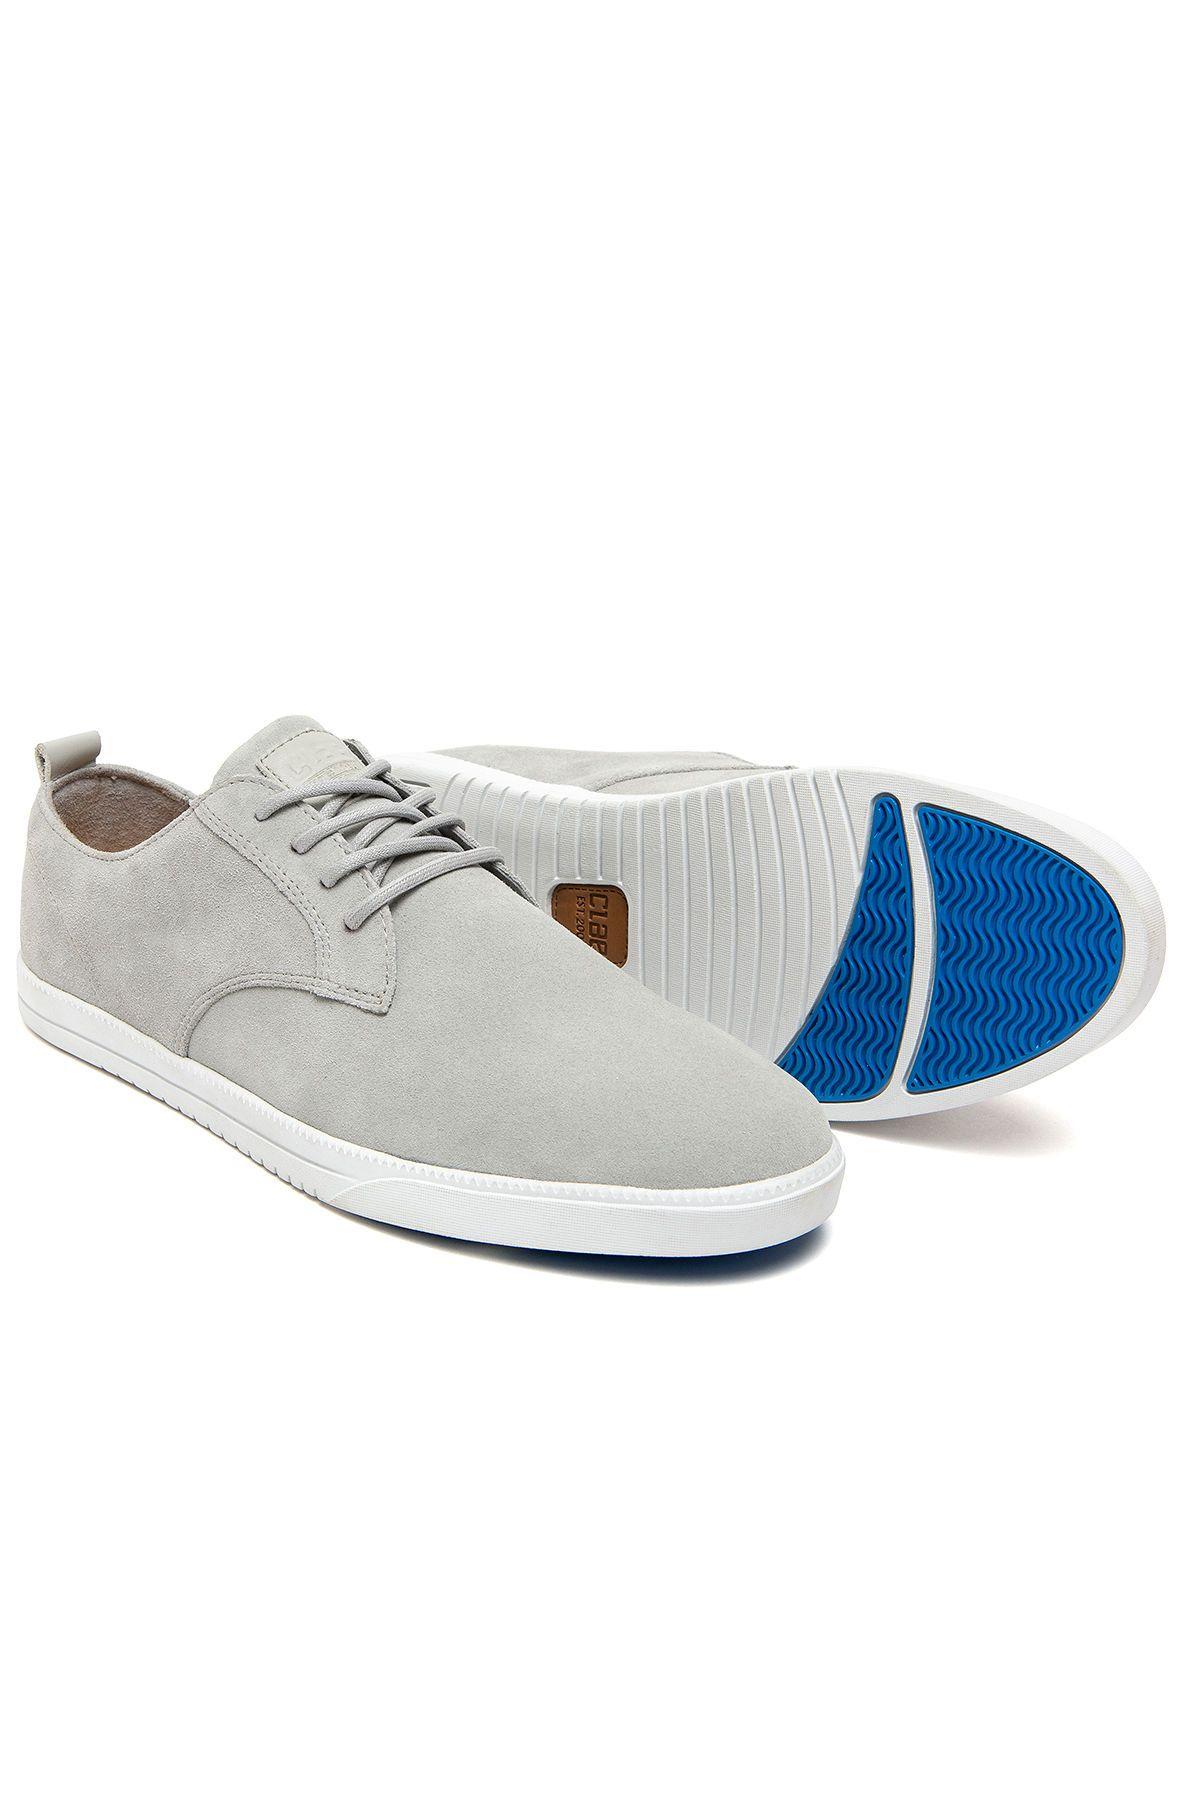 The Ellington Gravel Suede Shoes In Gray